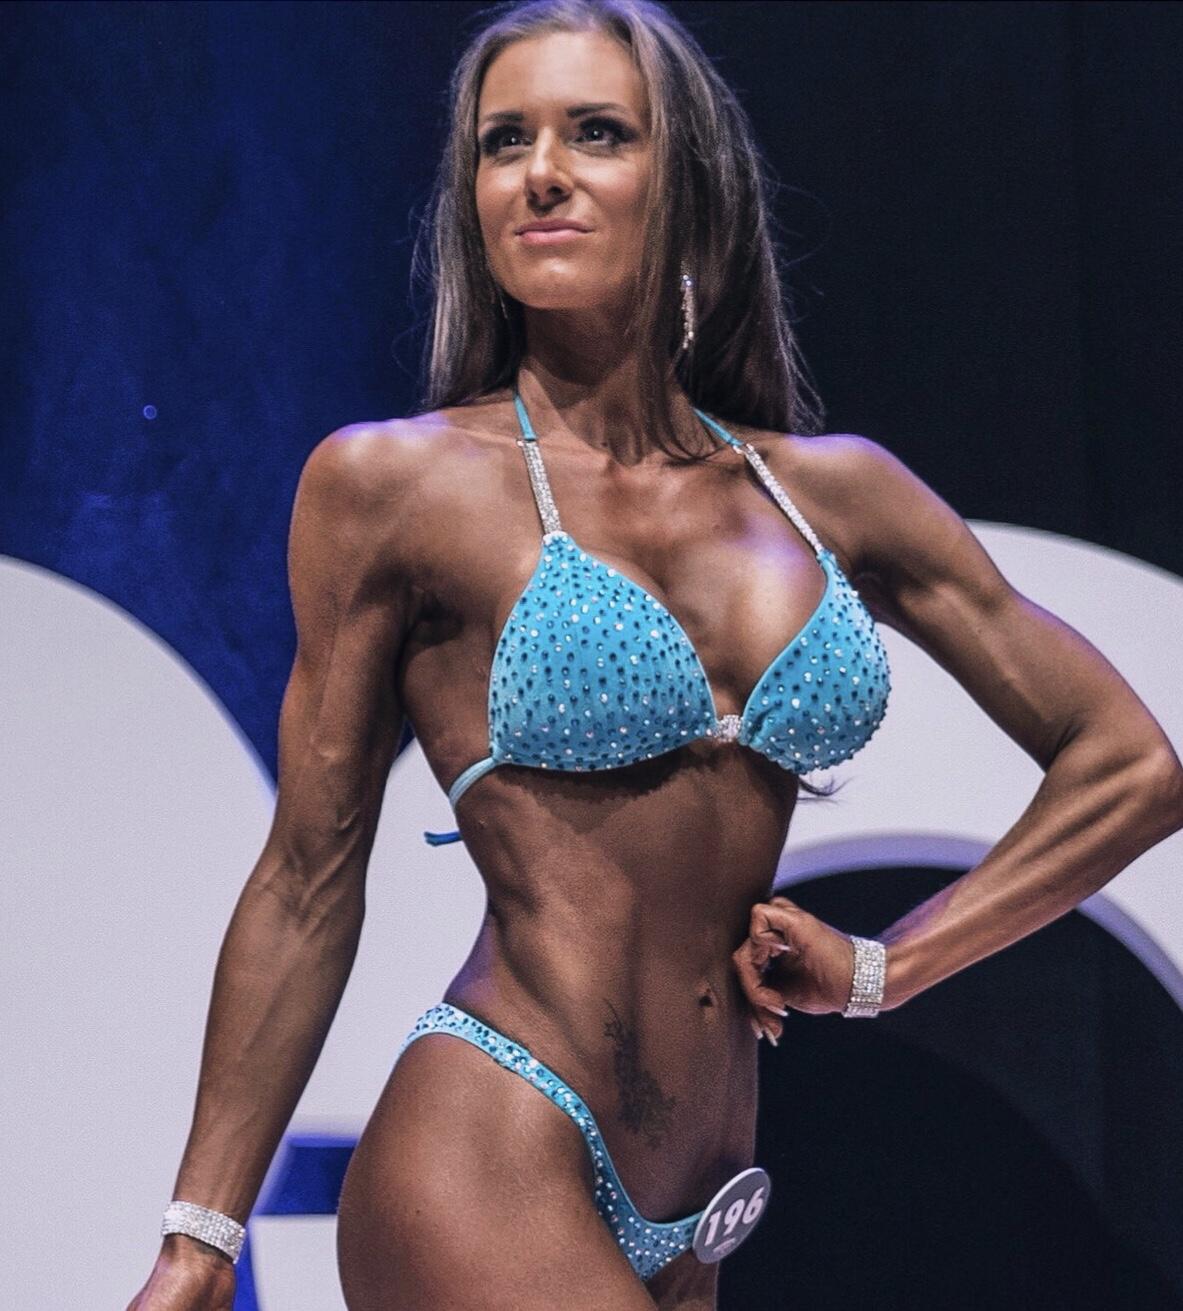 Bikini Prep Coach Laura Baker